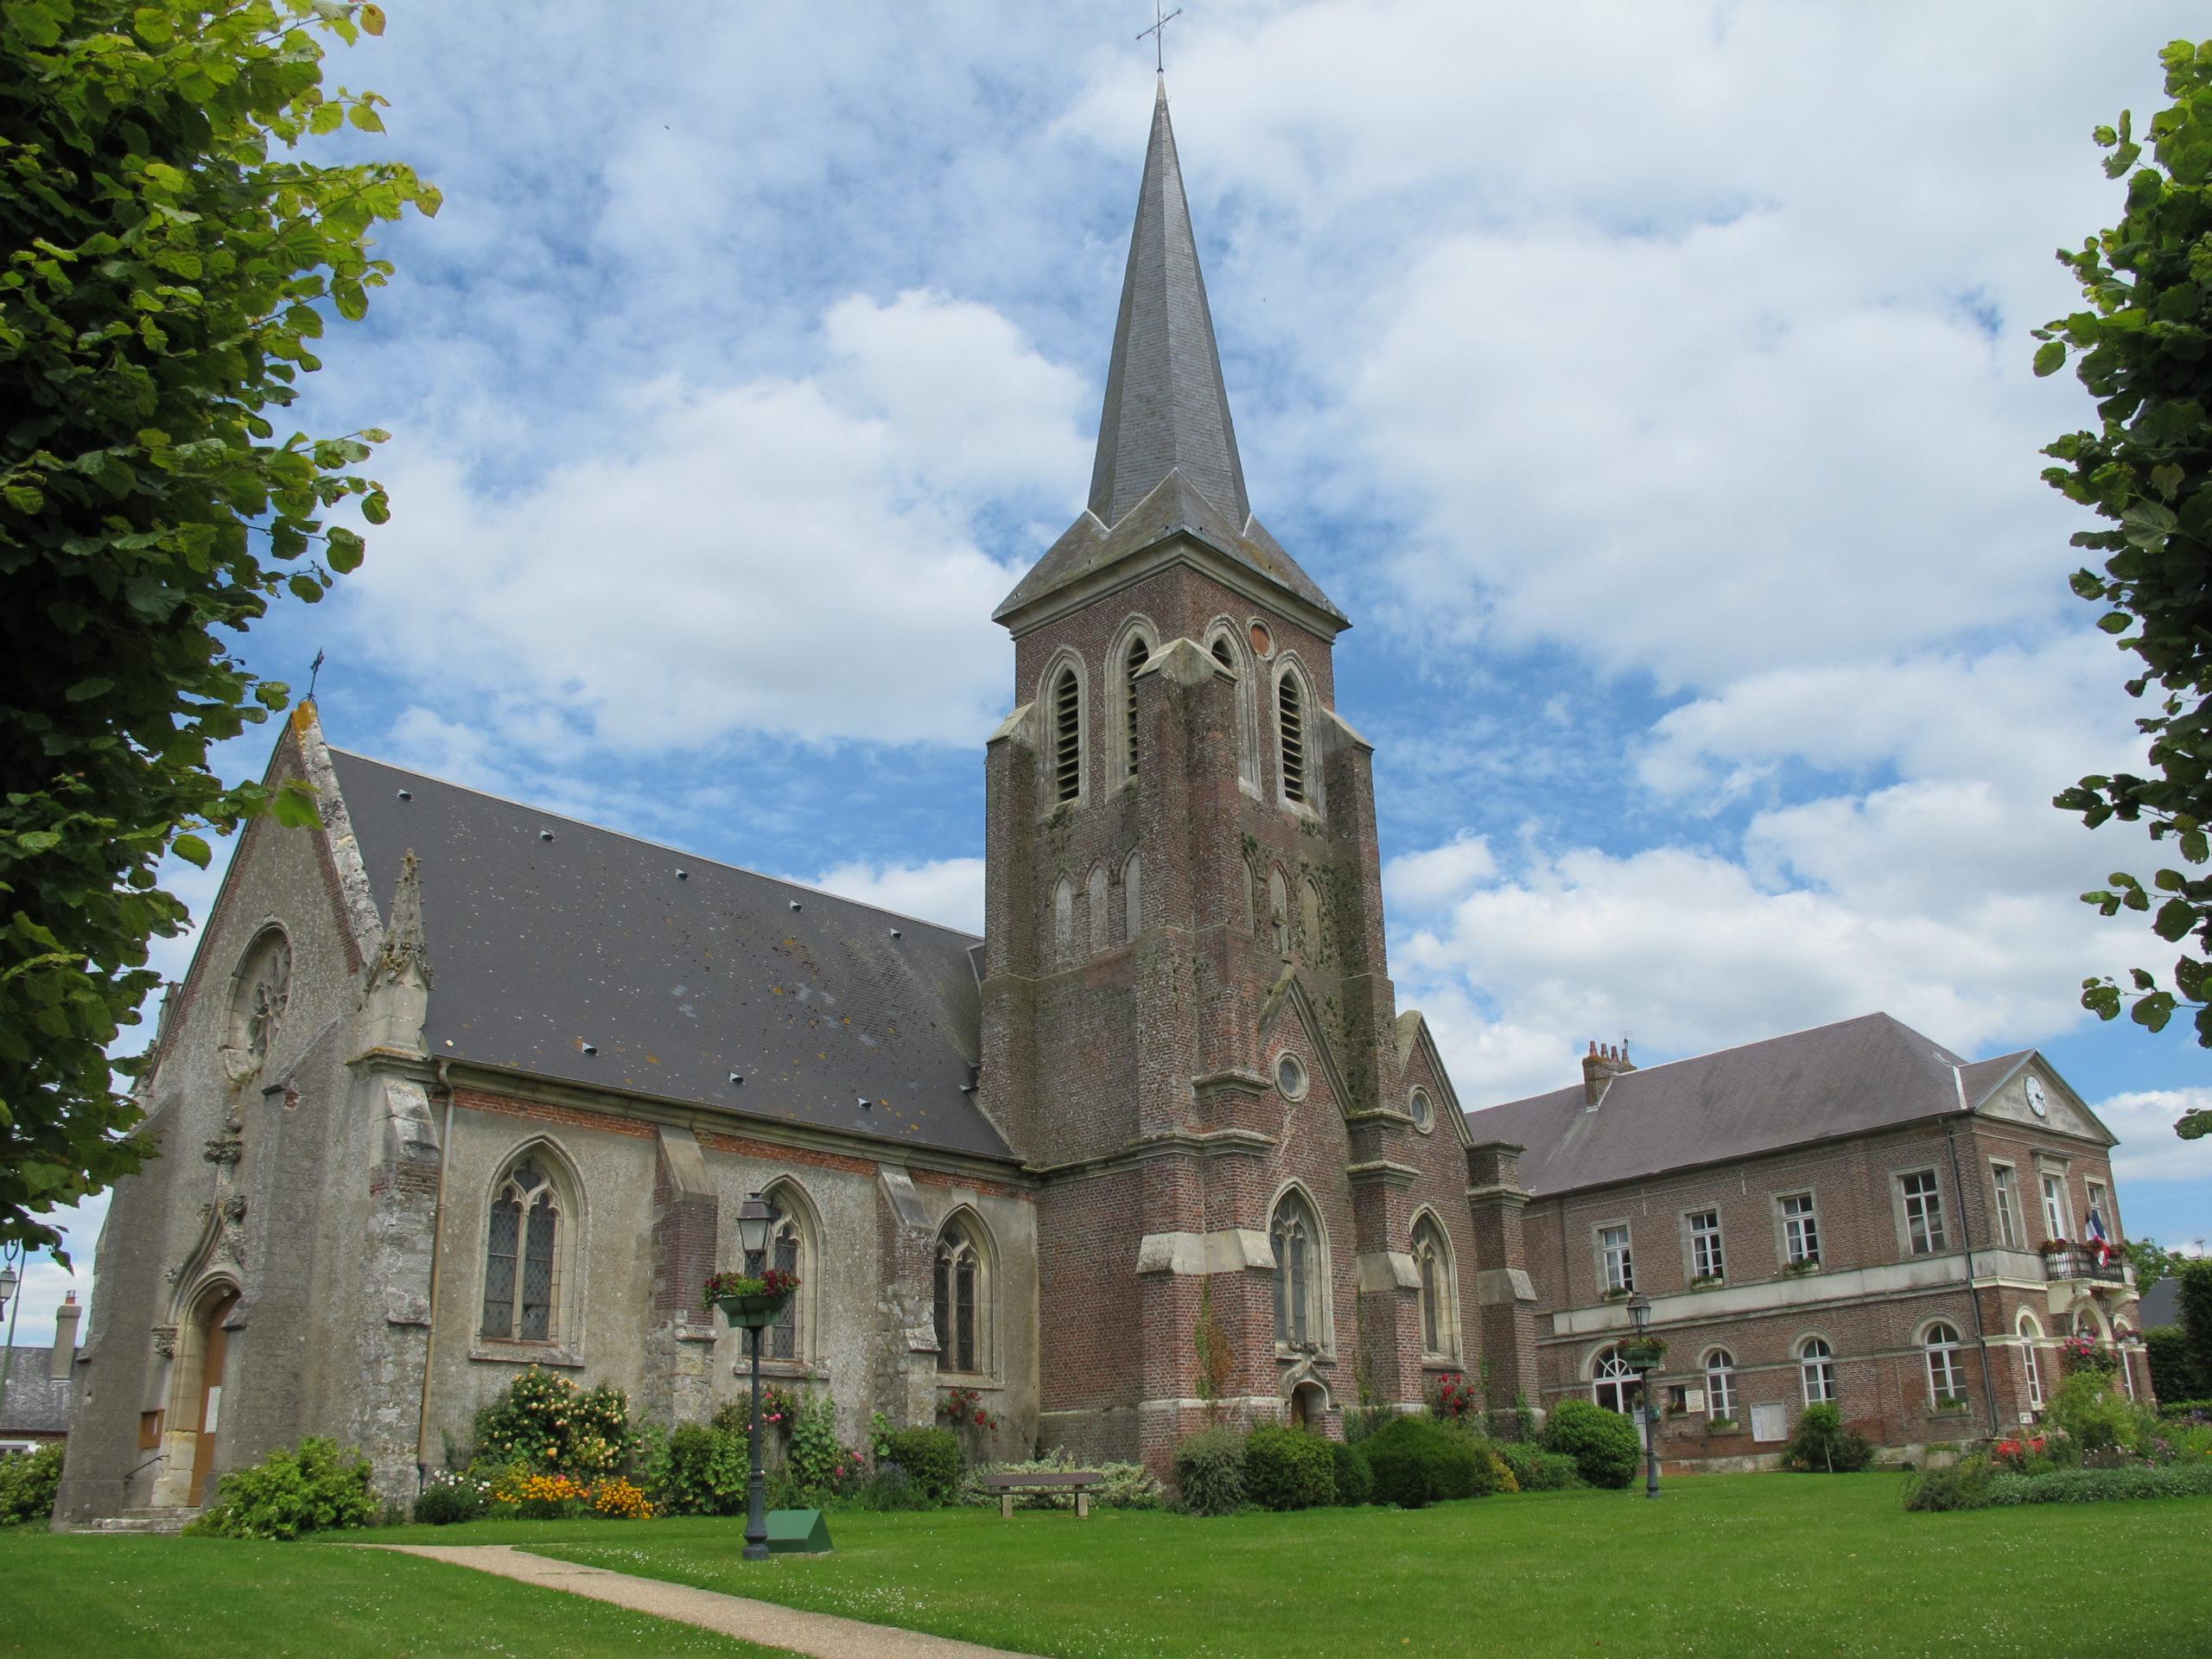 Eglise Le Coudray Saint Germer